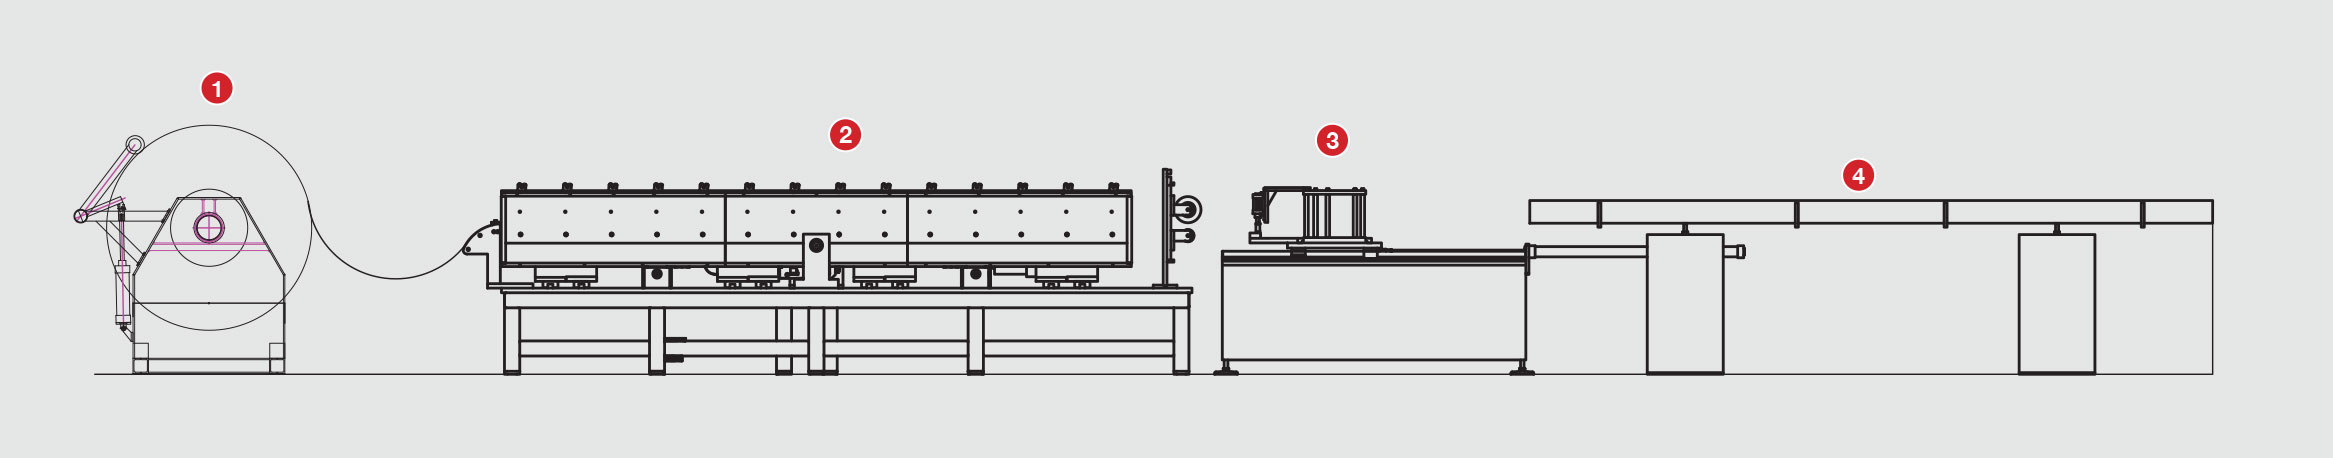 PVC-uretim-hatti-pencere-alcipan-tavan-Profil-profiller-sema